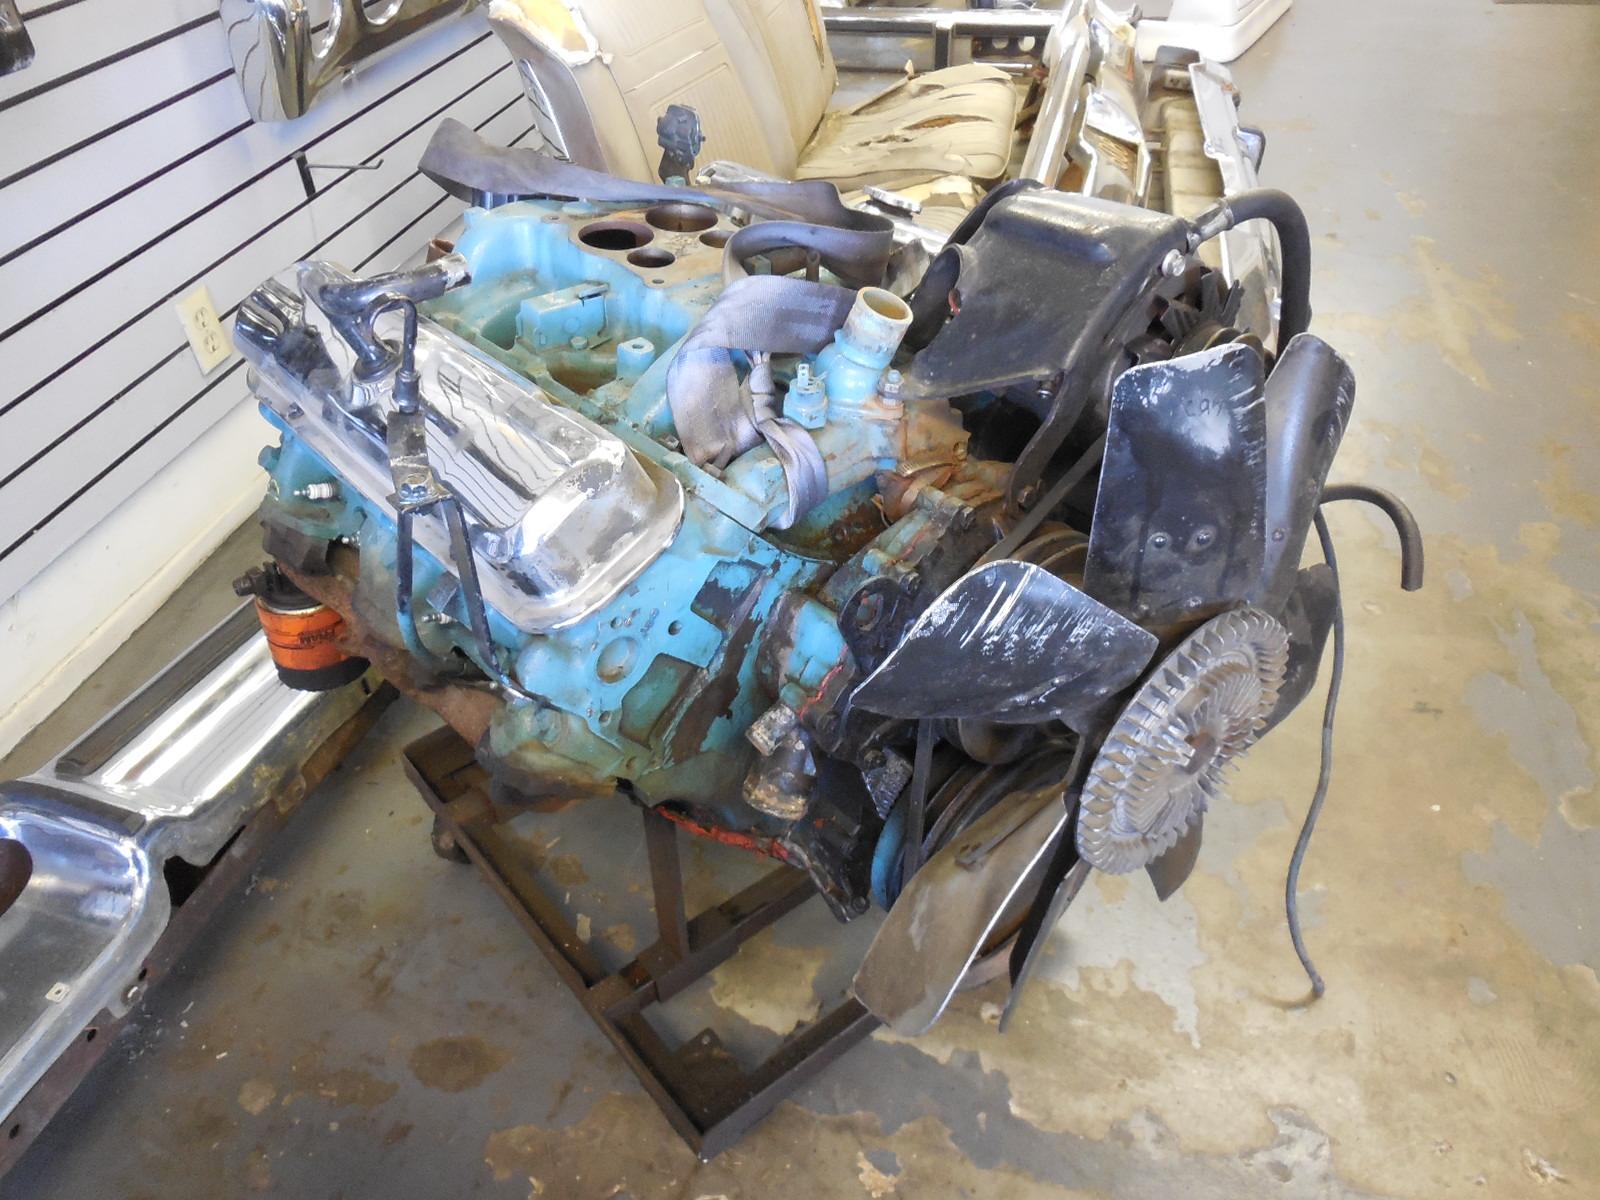 1970 Pontiac 455 HO Engine | GM Sports